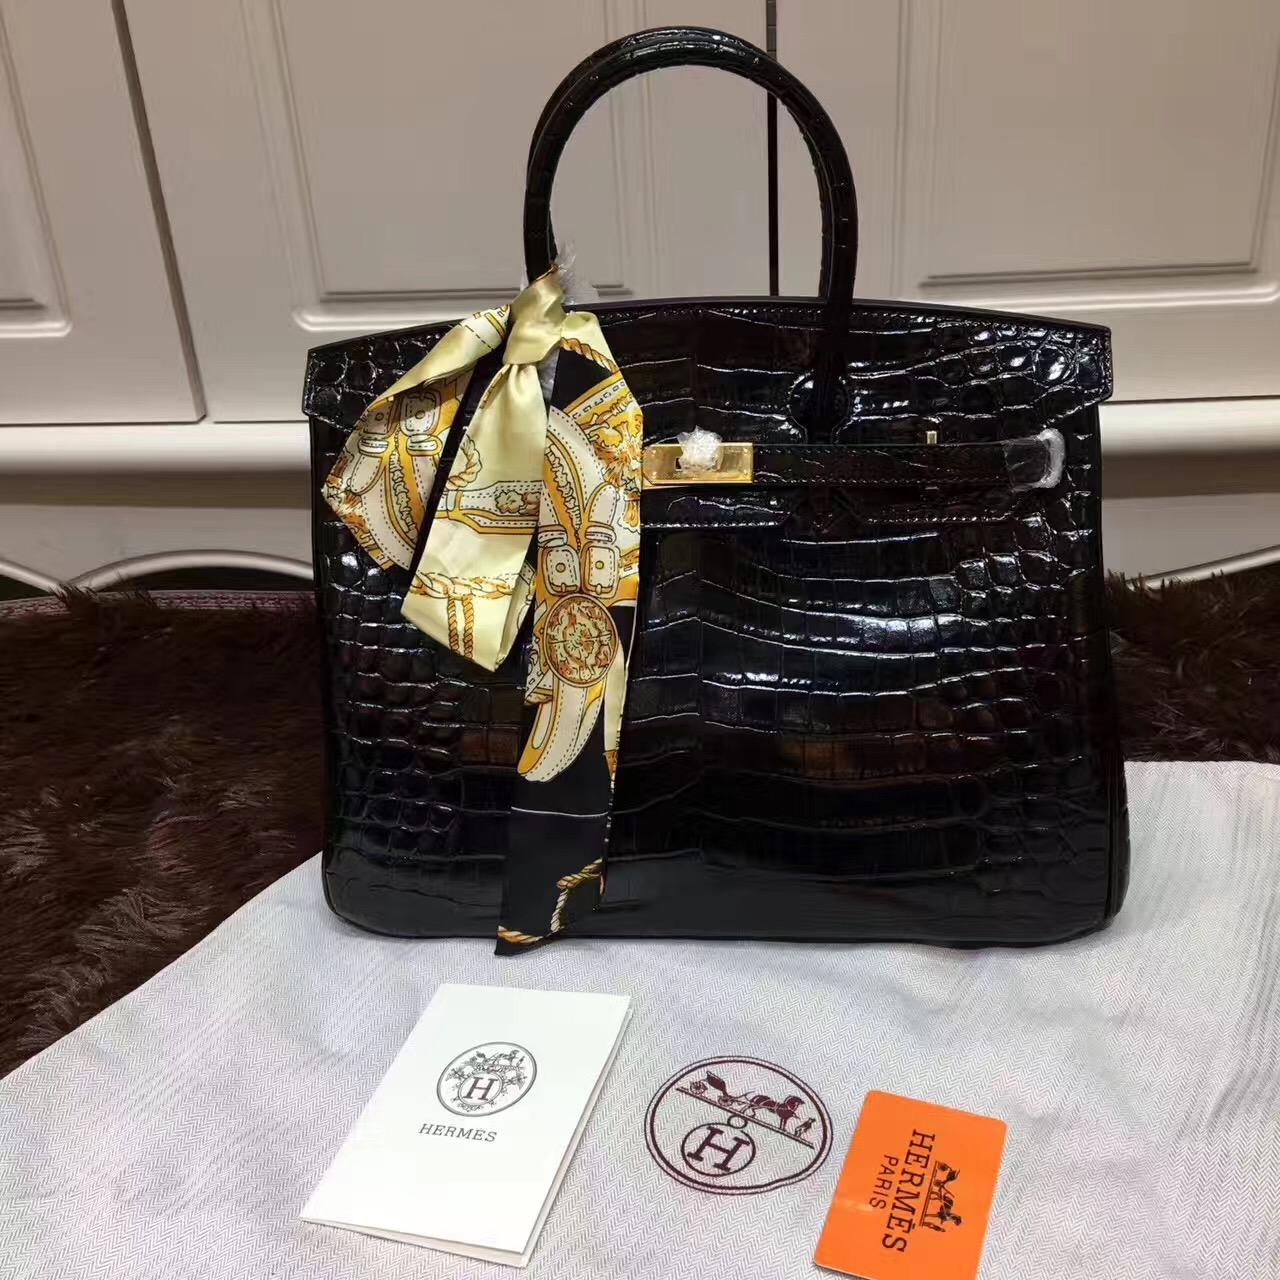 d438cf3e1e Hermes Birkin 35cm Handbag Crocodile Leather Black Gold